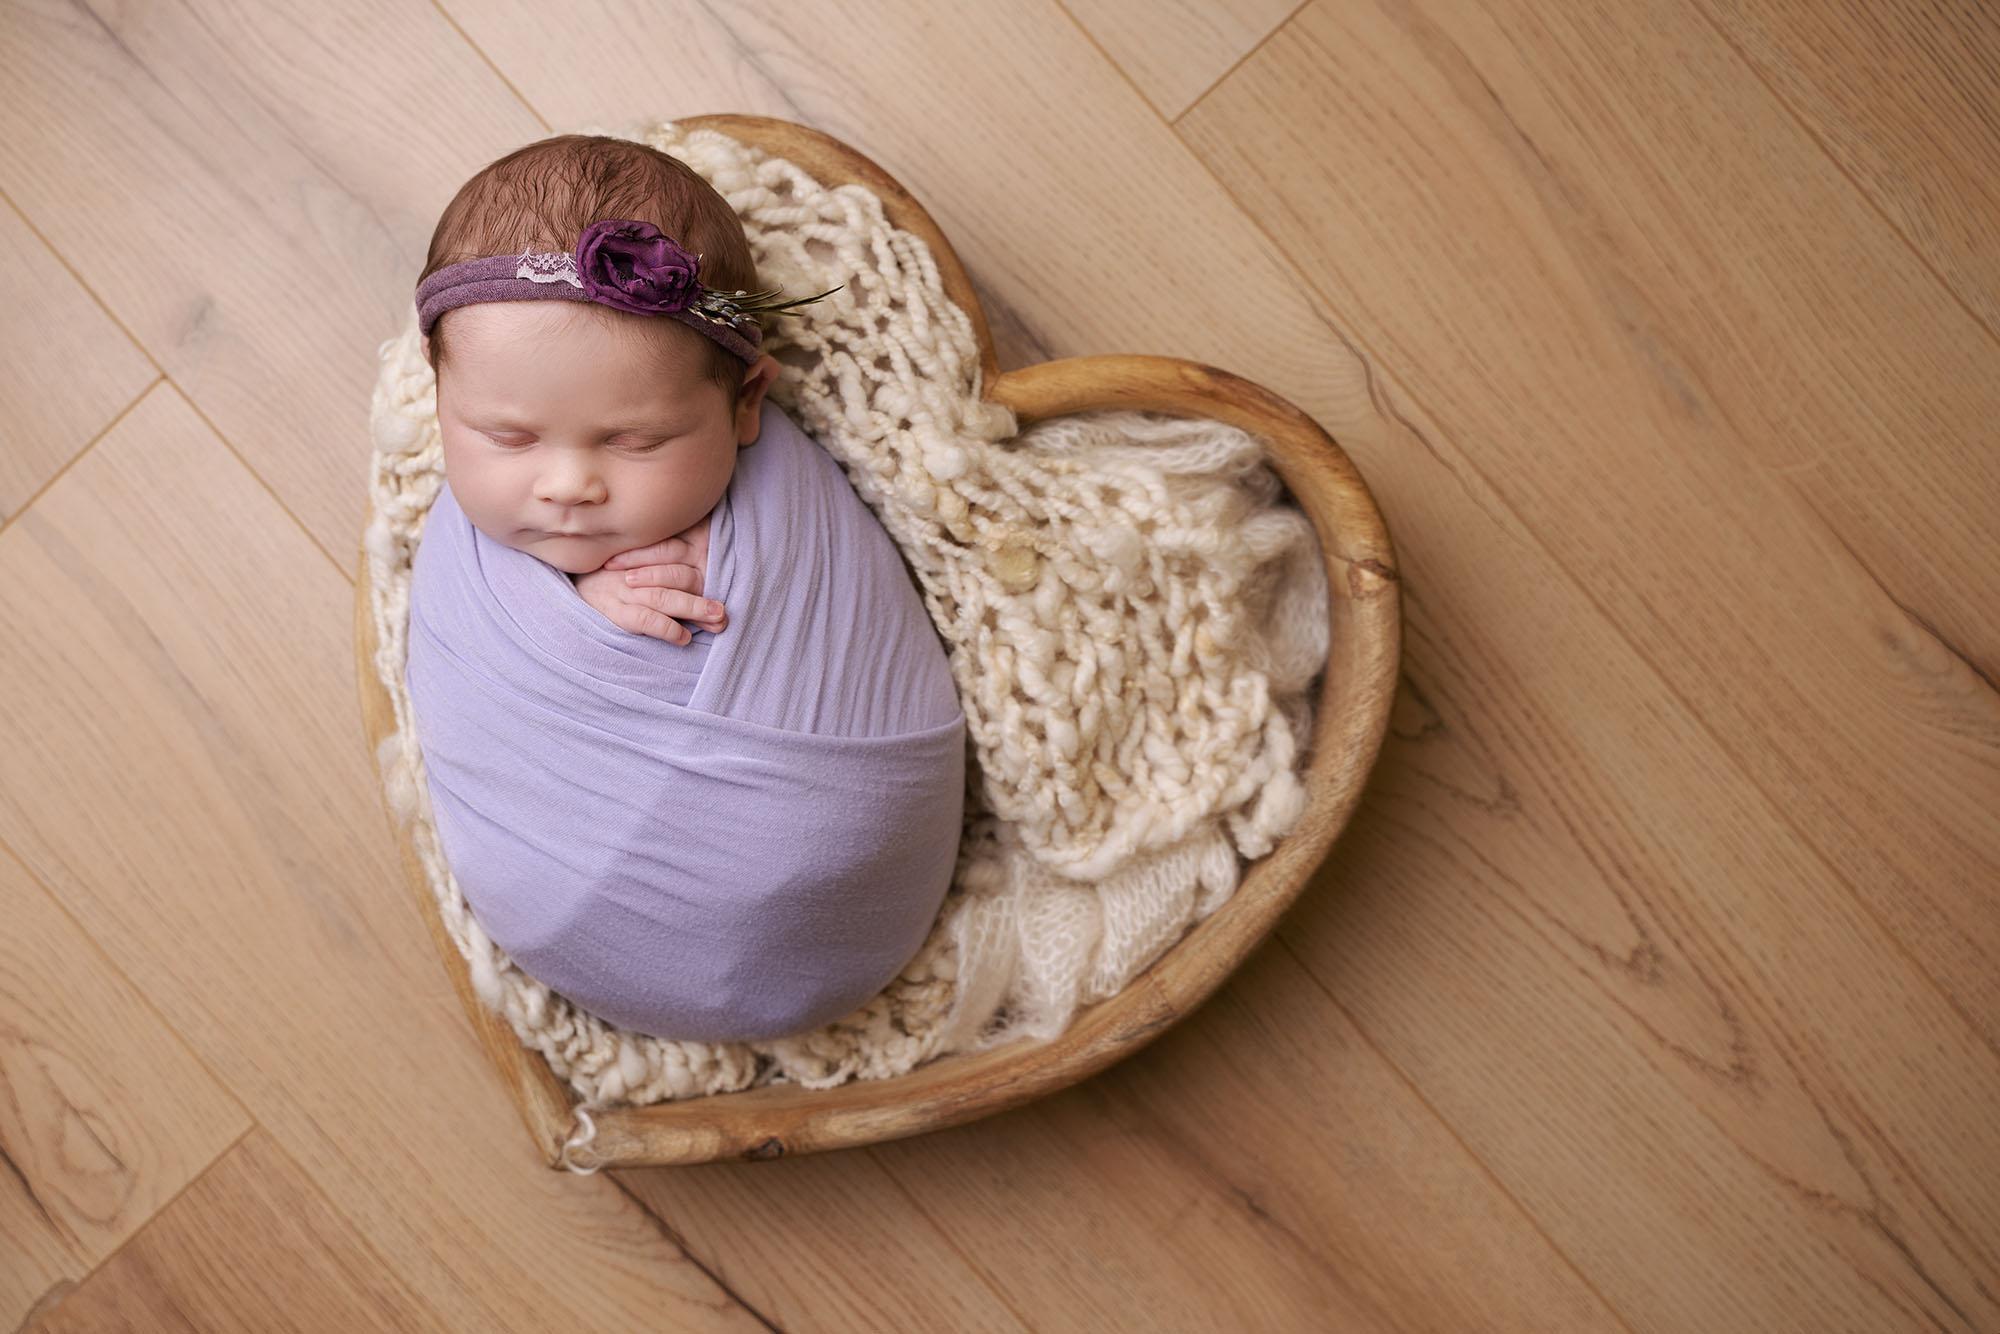 professional maternity photoshoot of pregnant woman by Edinburgh maternity photographer Beautiful Bairns Photography